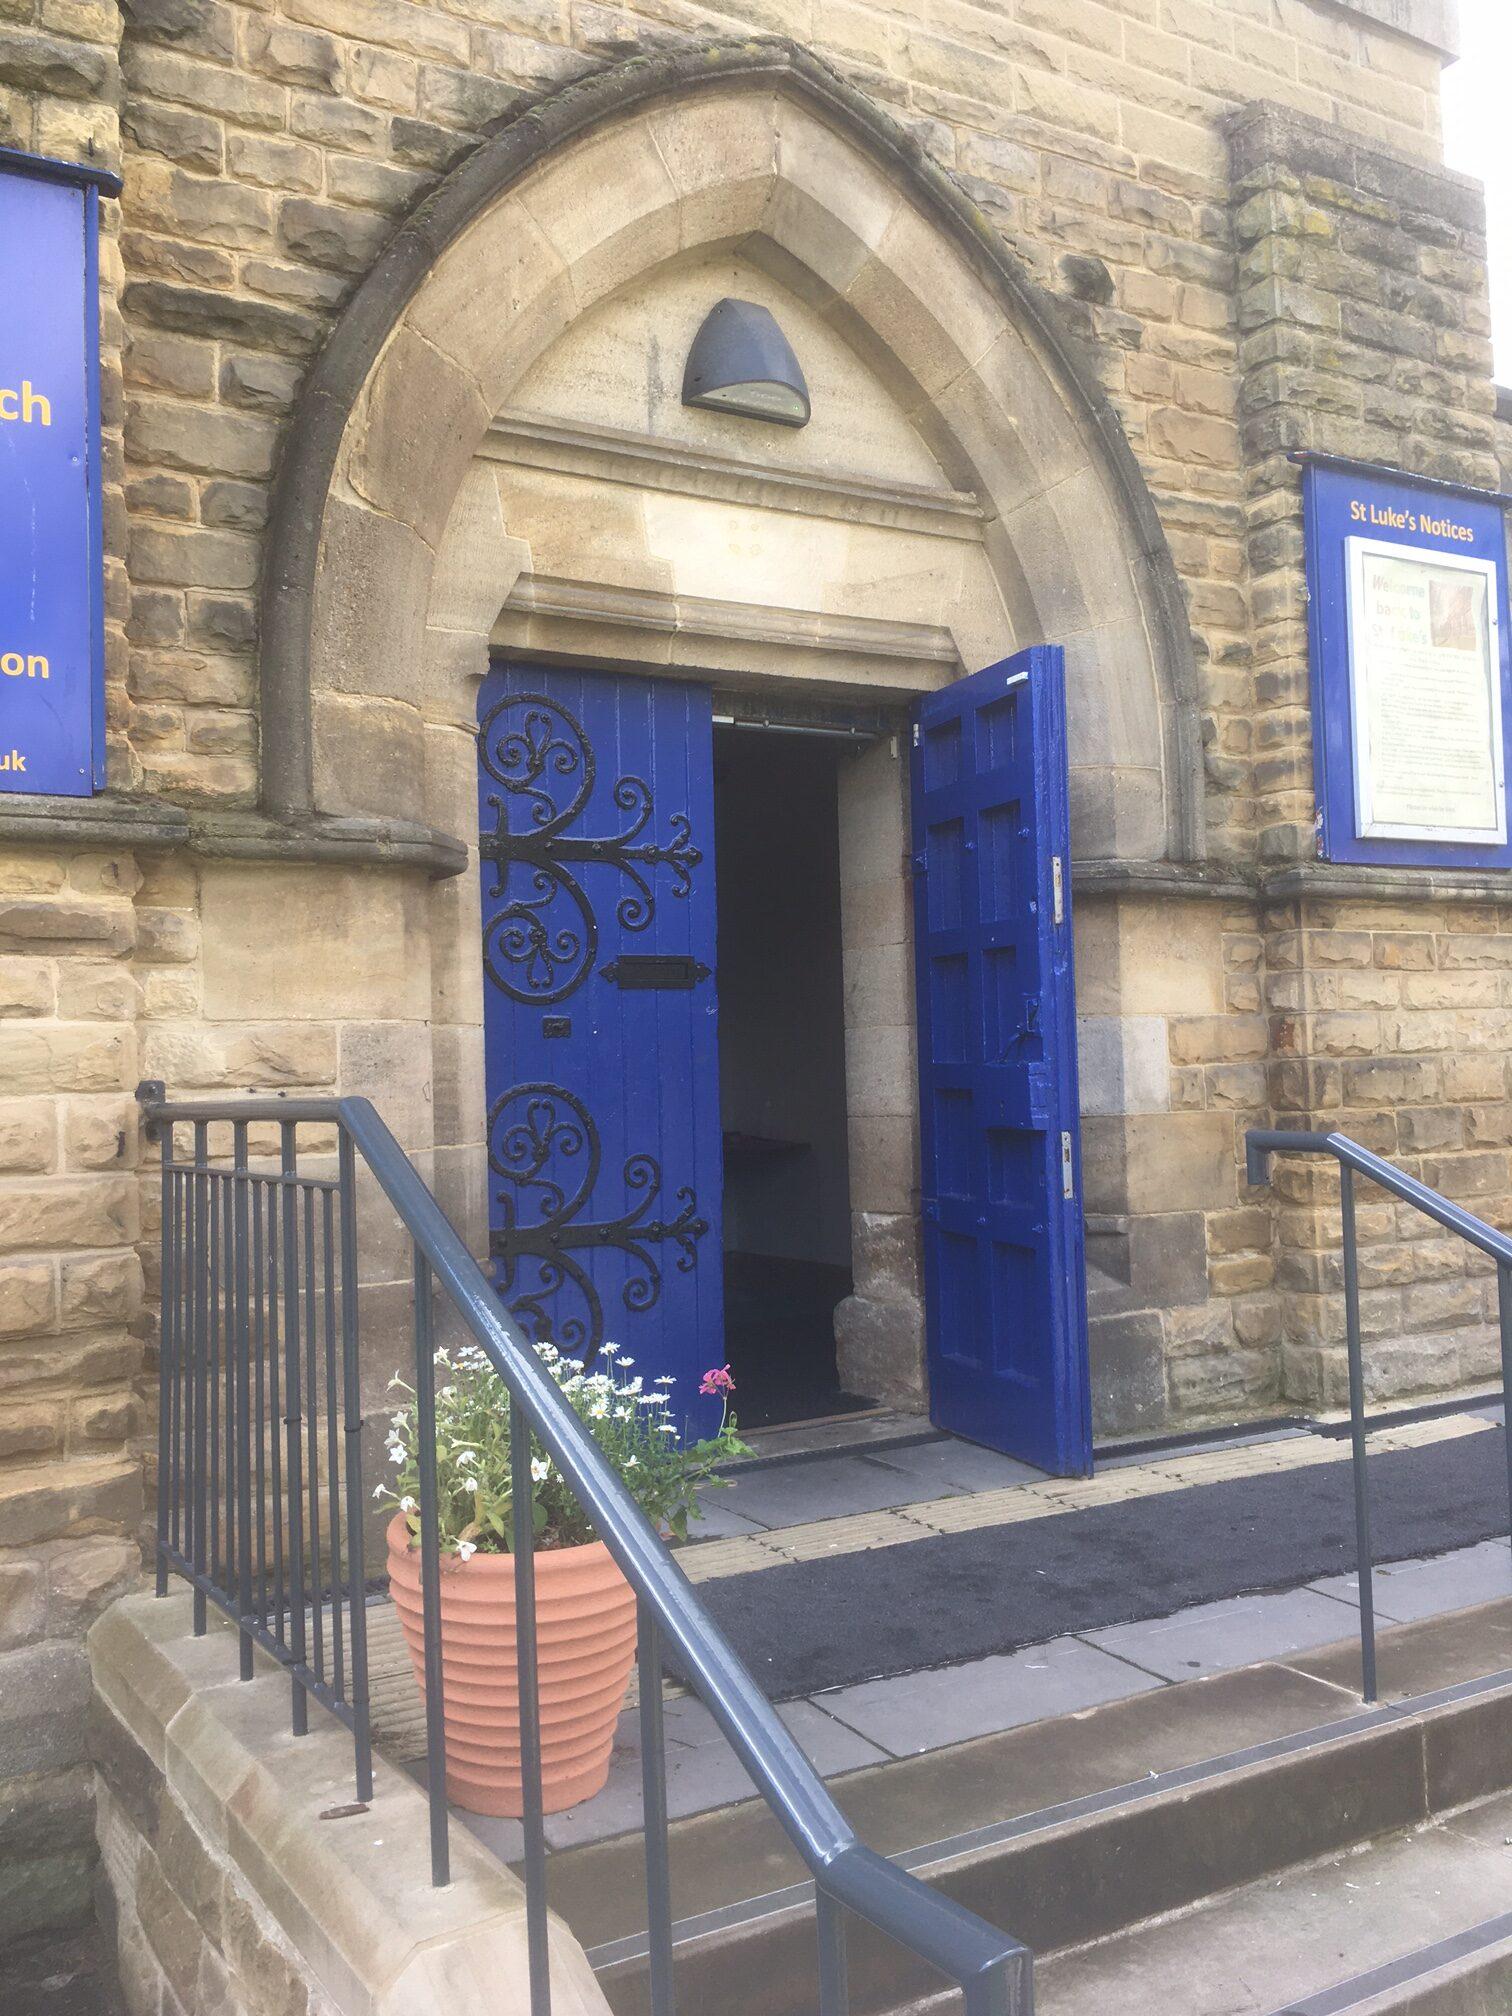 St Luke's Church, Holbeck, Leeds